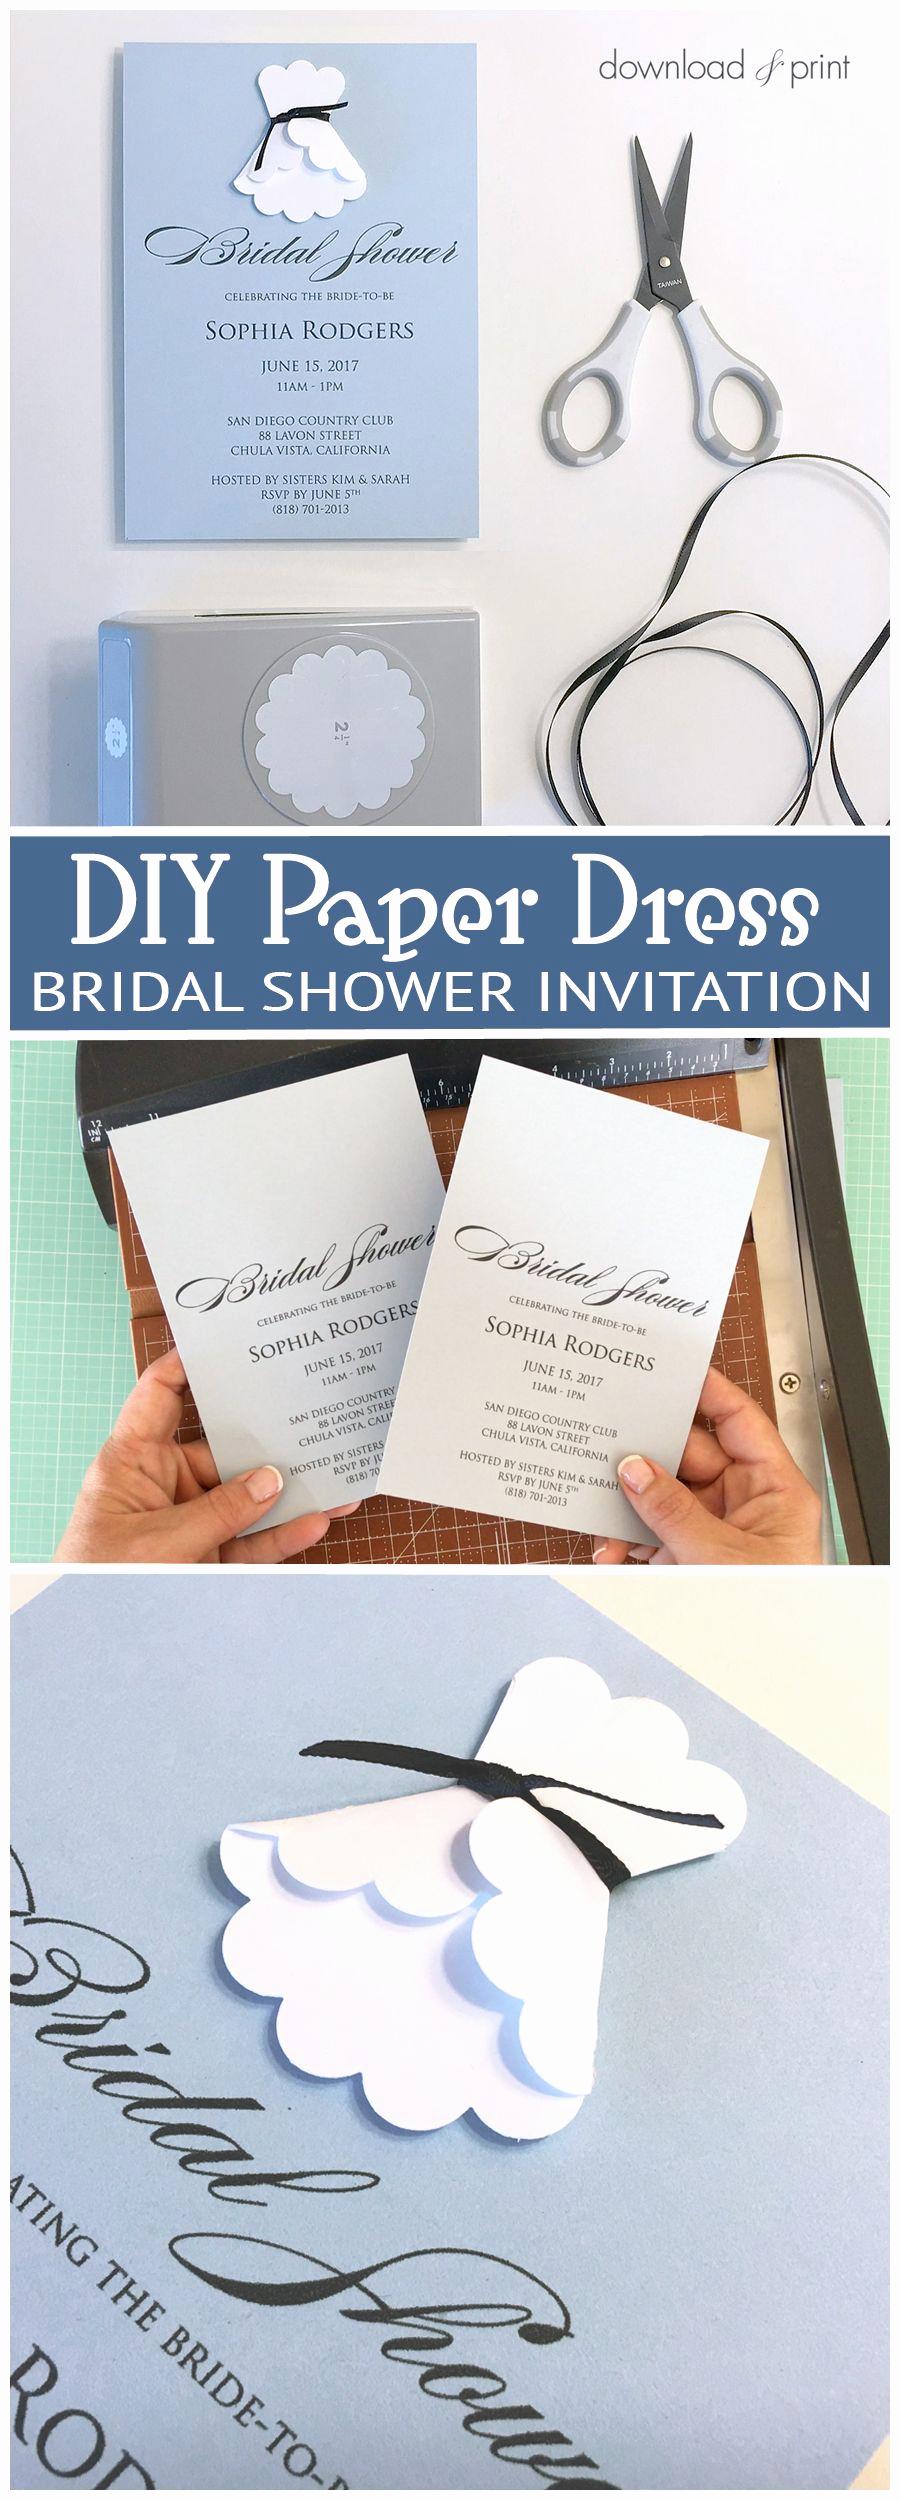 Free Printable Bridal Shower Invitations Lovely Sweet and Simple Bridal Shower Invitation with A Diy Paper